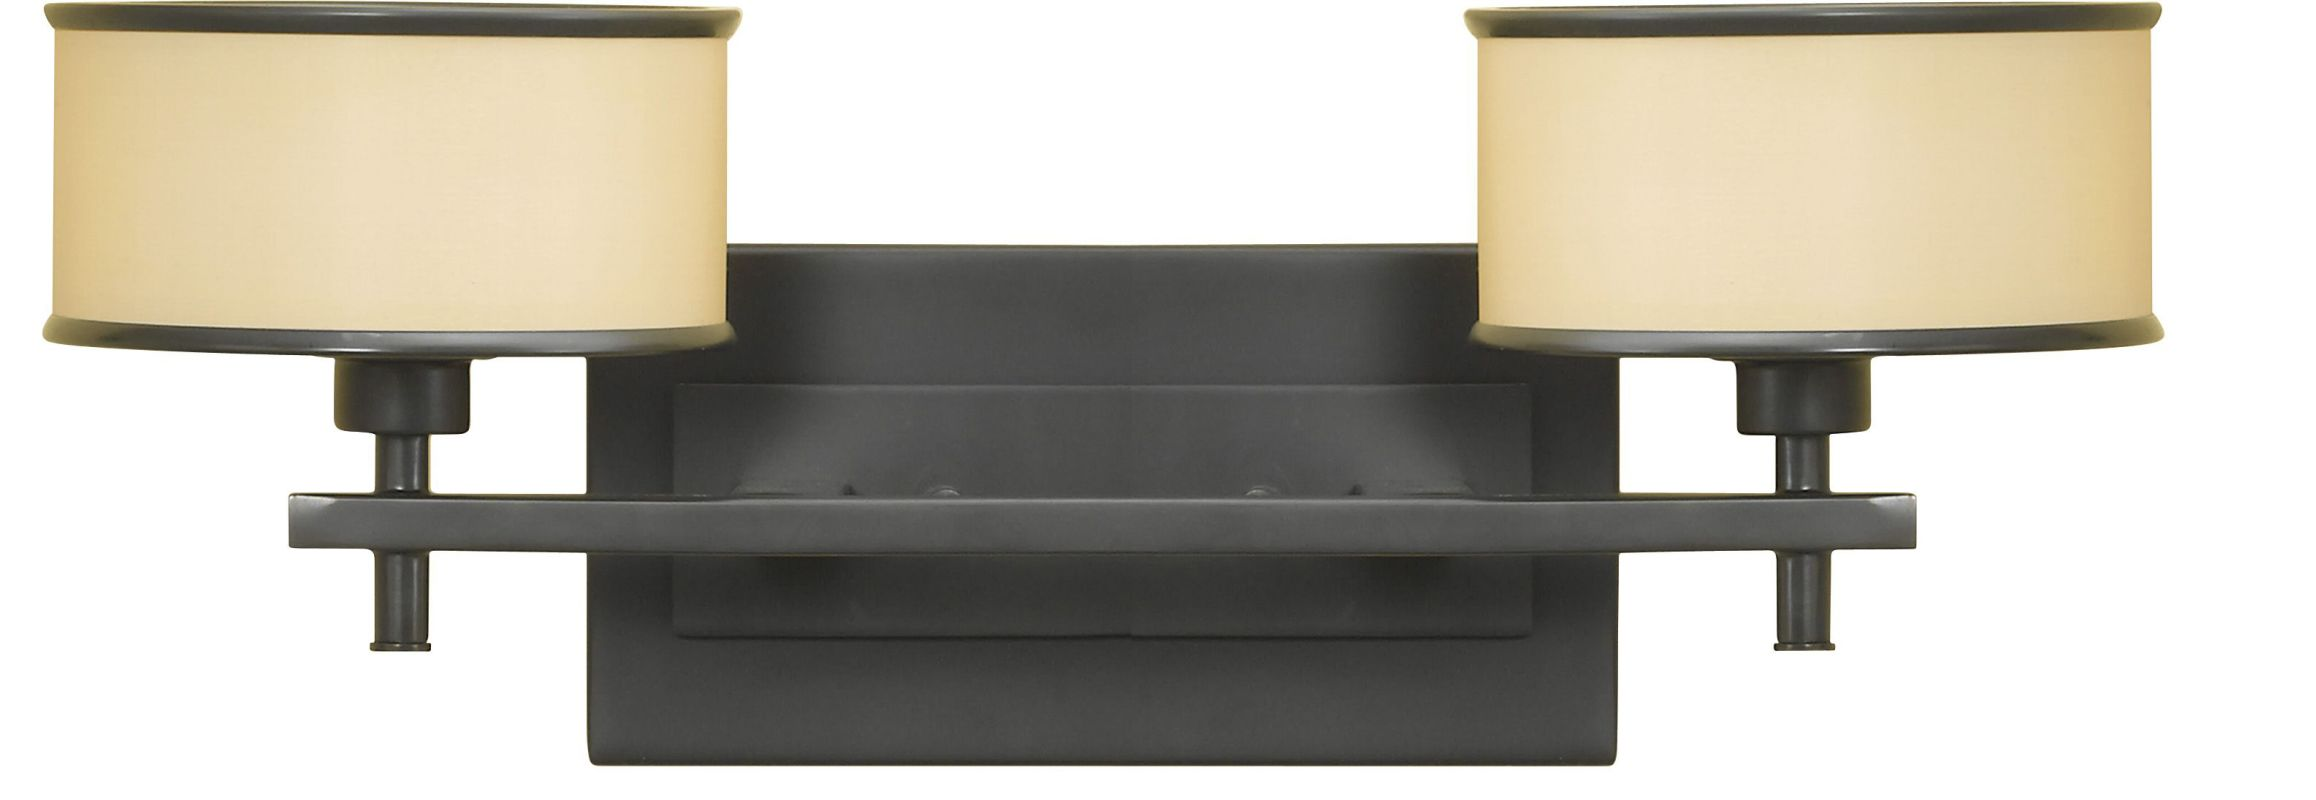 Murray Feiss VS13702Bronze Contemporary Casual Luxury Bathroom Light